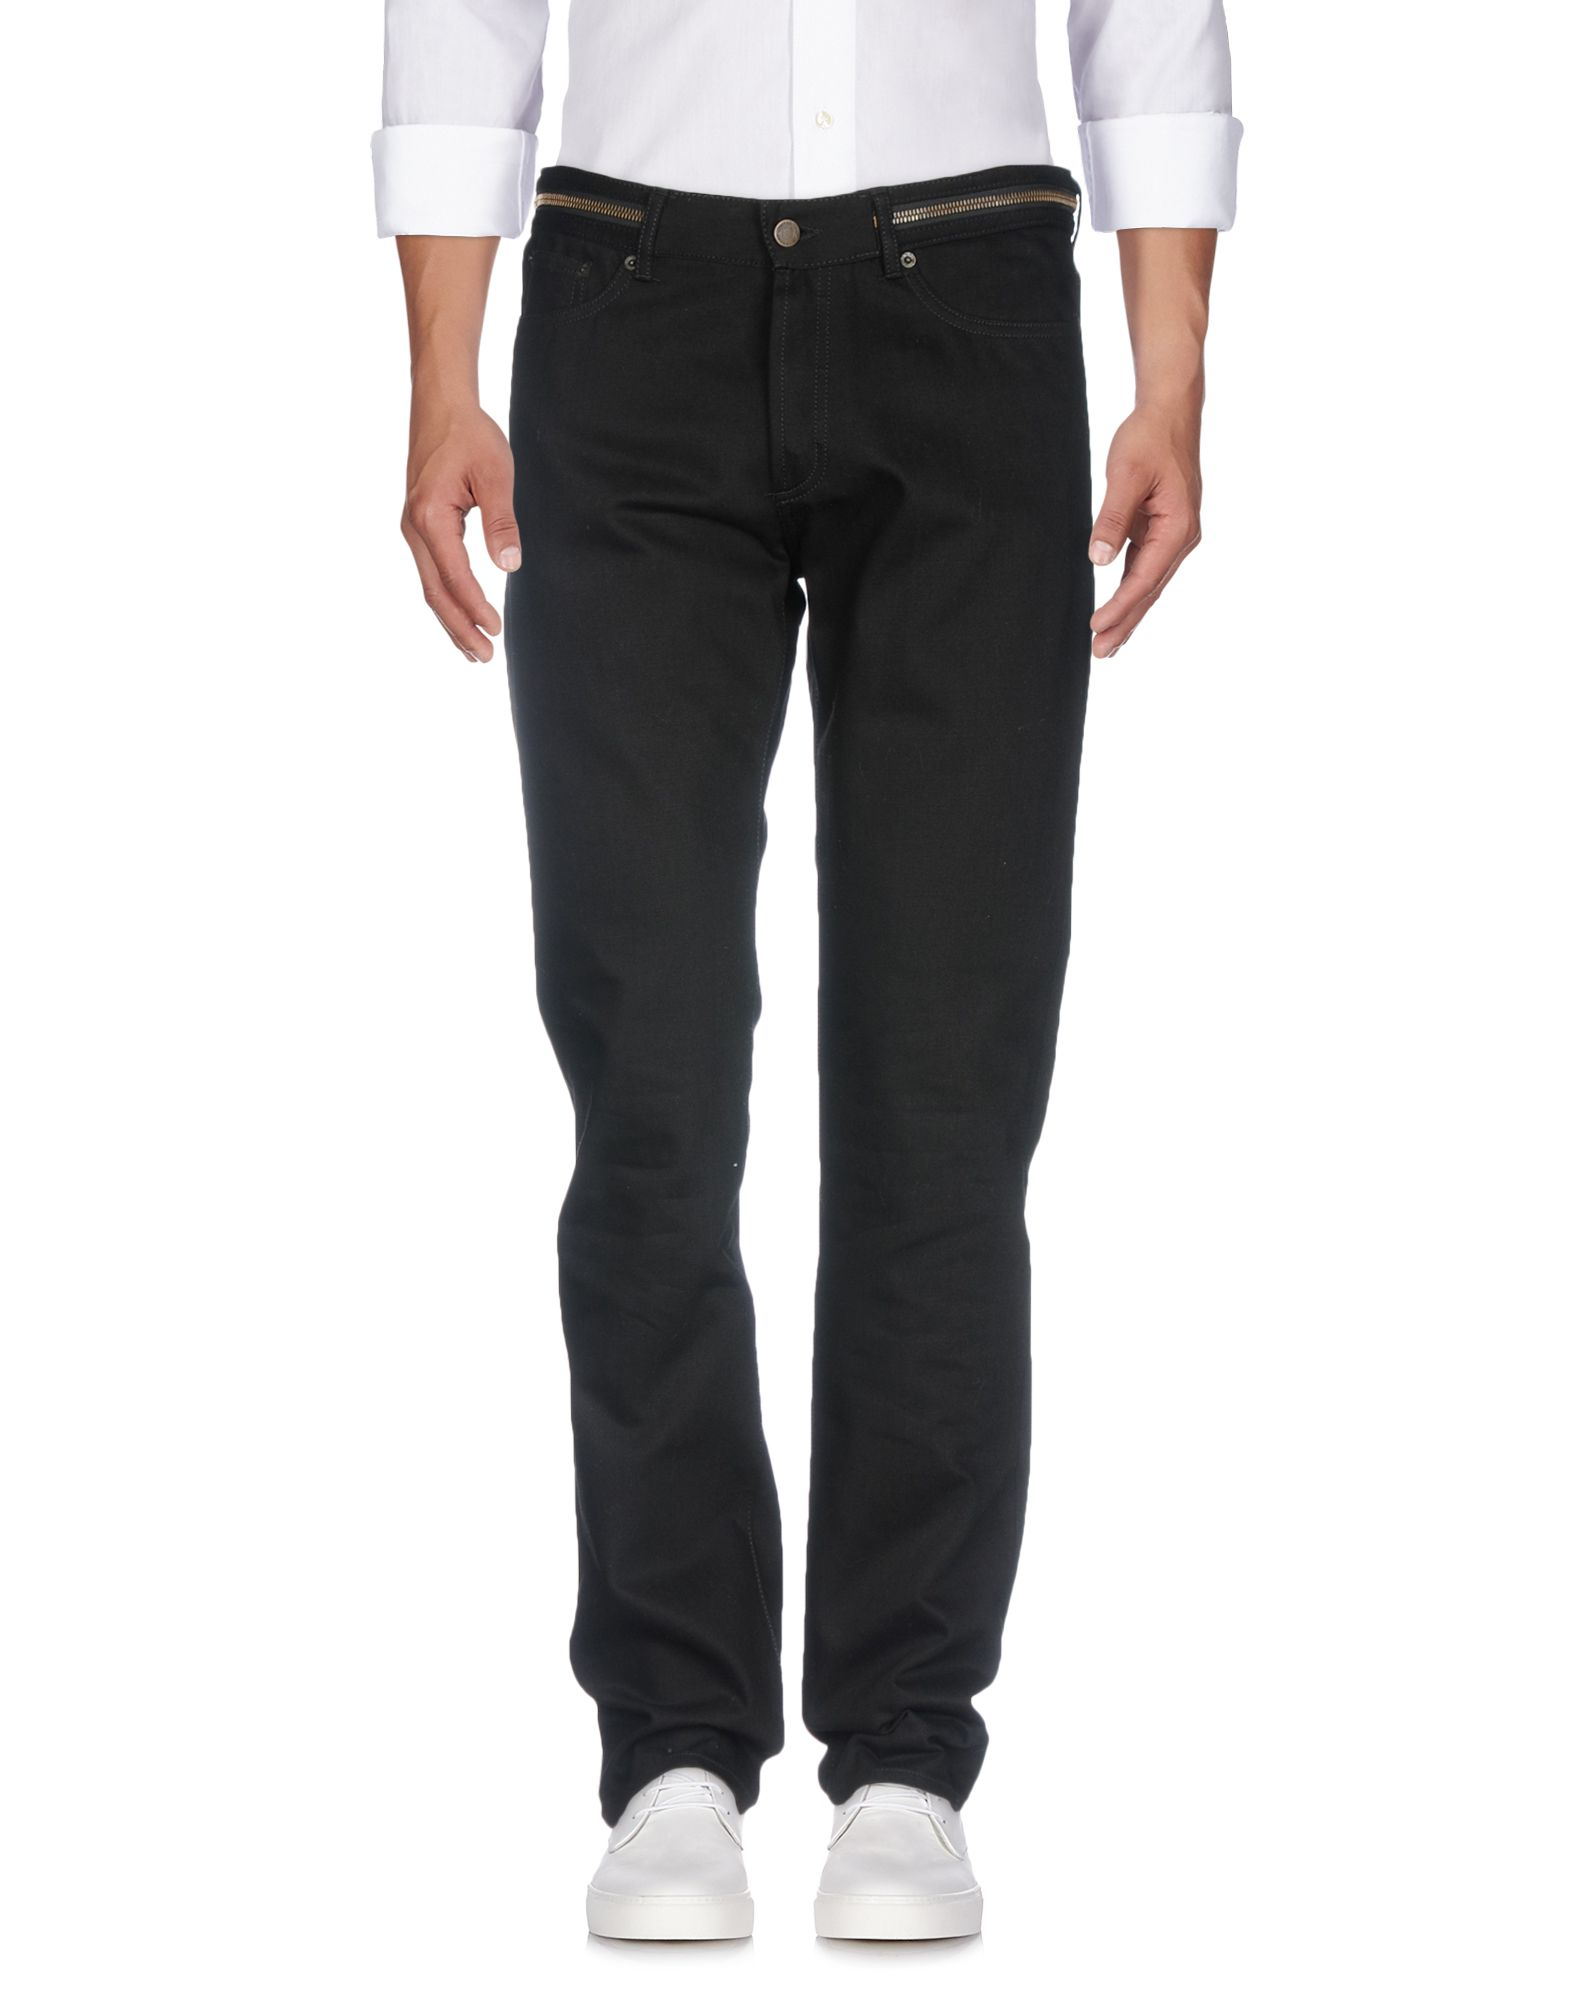 Pantaloni Jeans Givenchy Uomo - Acquista online su